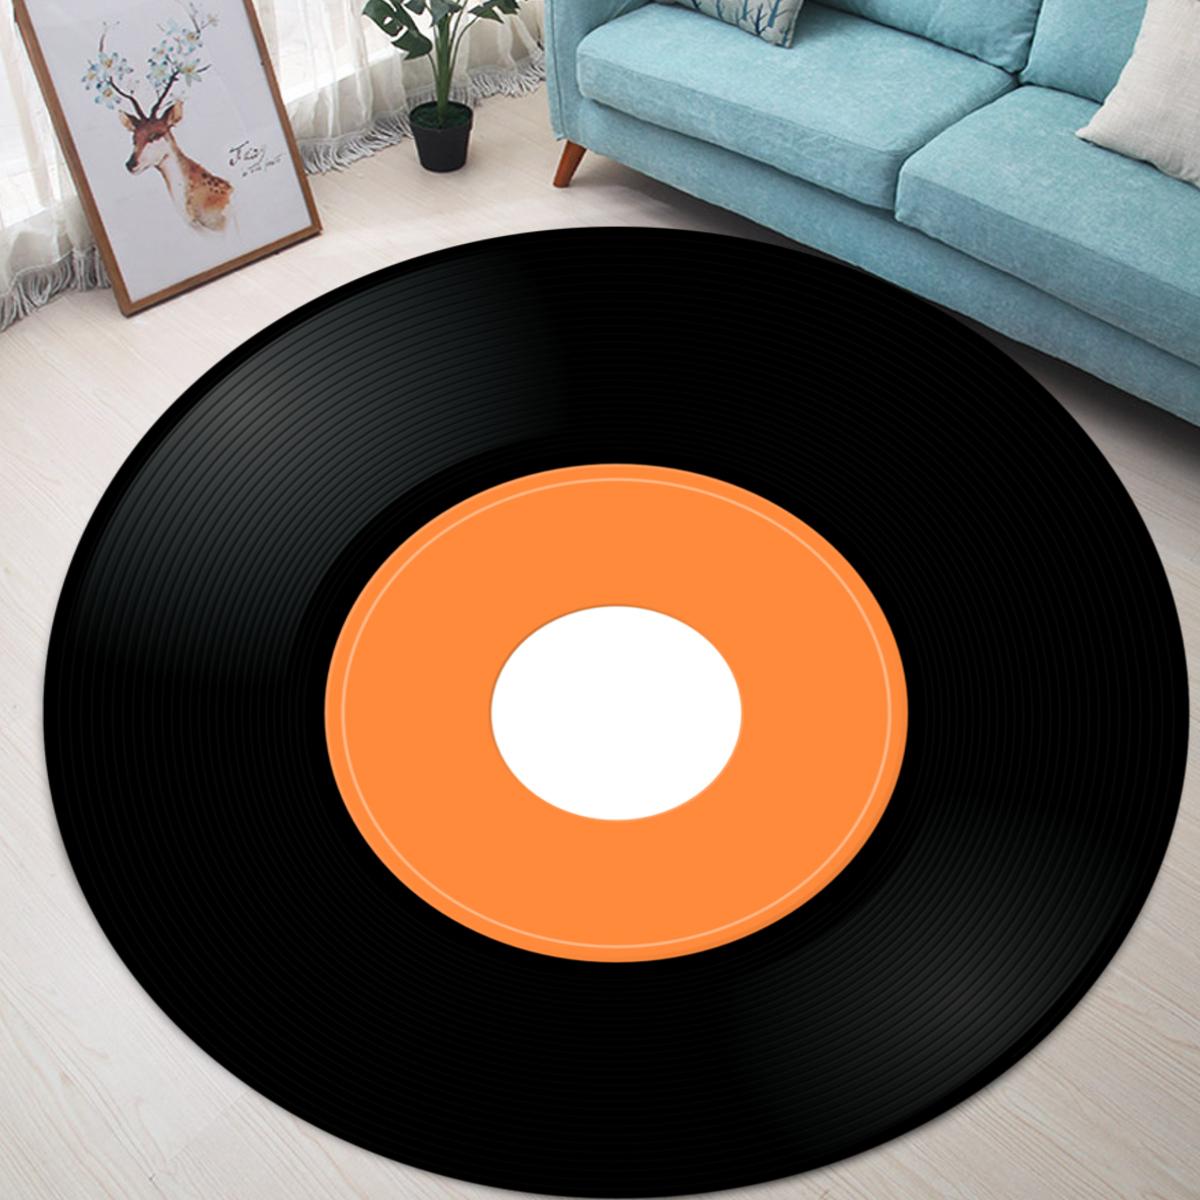 Vinyl Record Printed Soft Fabric Round Floor Mat Carpet Room Area Bedroom Rug Seat Cover Door Rugs